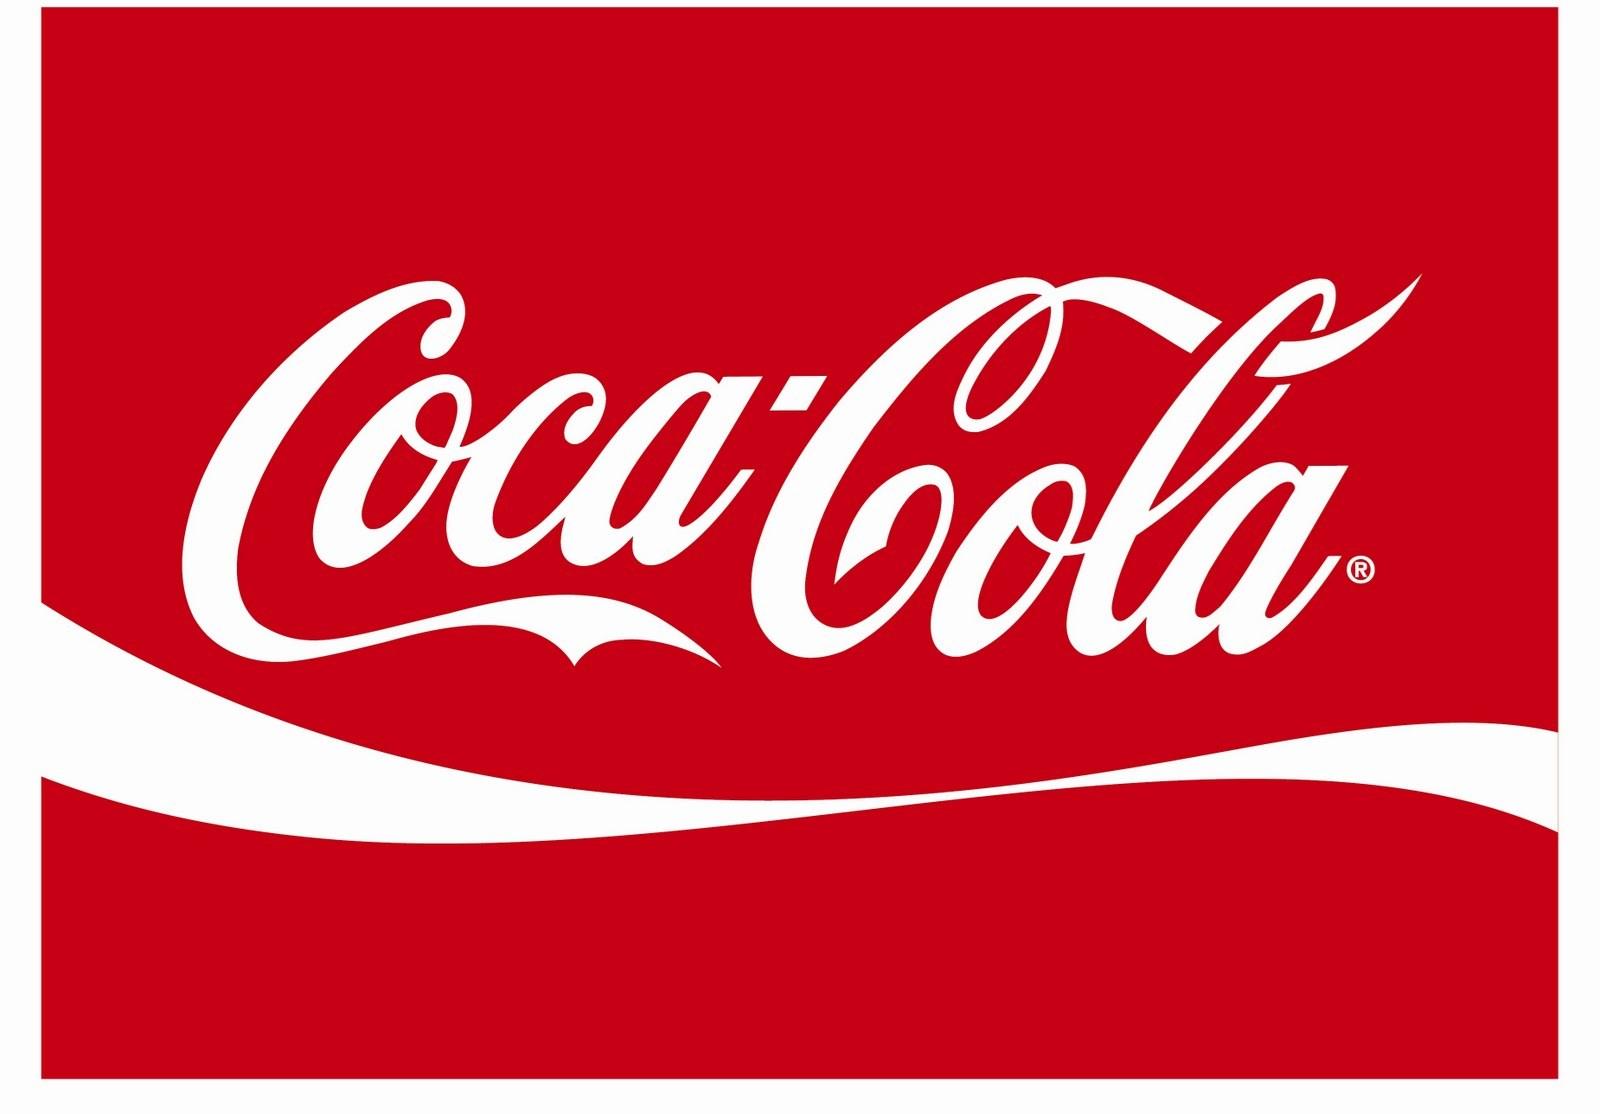 "coca cola complementors Akshay berrydeepika mittal gurveen kaur richa joshi shekhar cvr the philosophy ""all of us in the coca-cola family wake up eac."